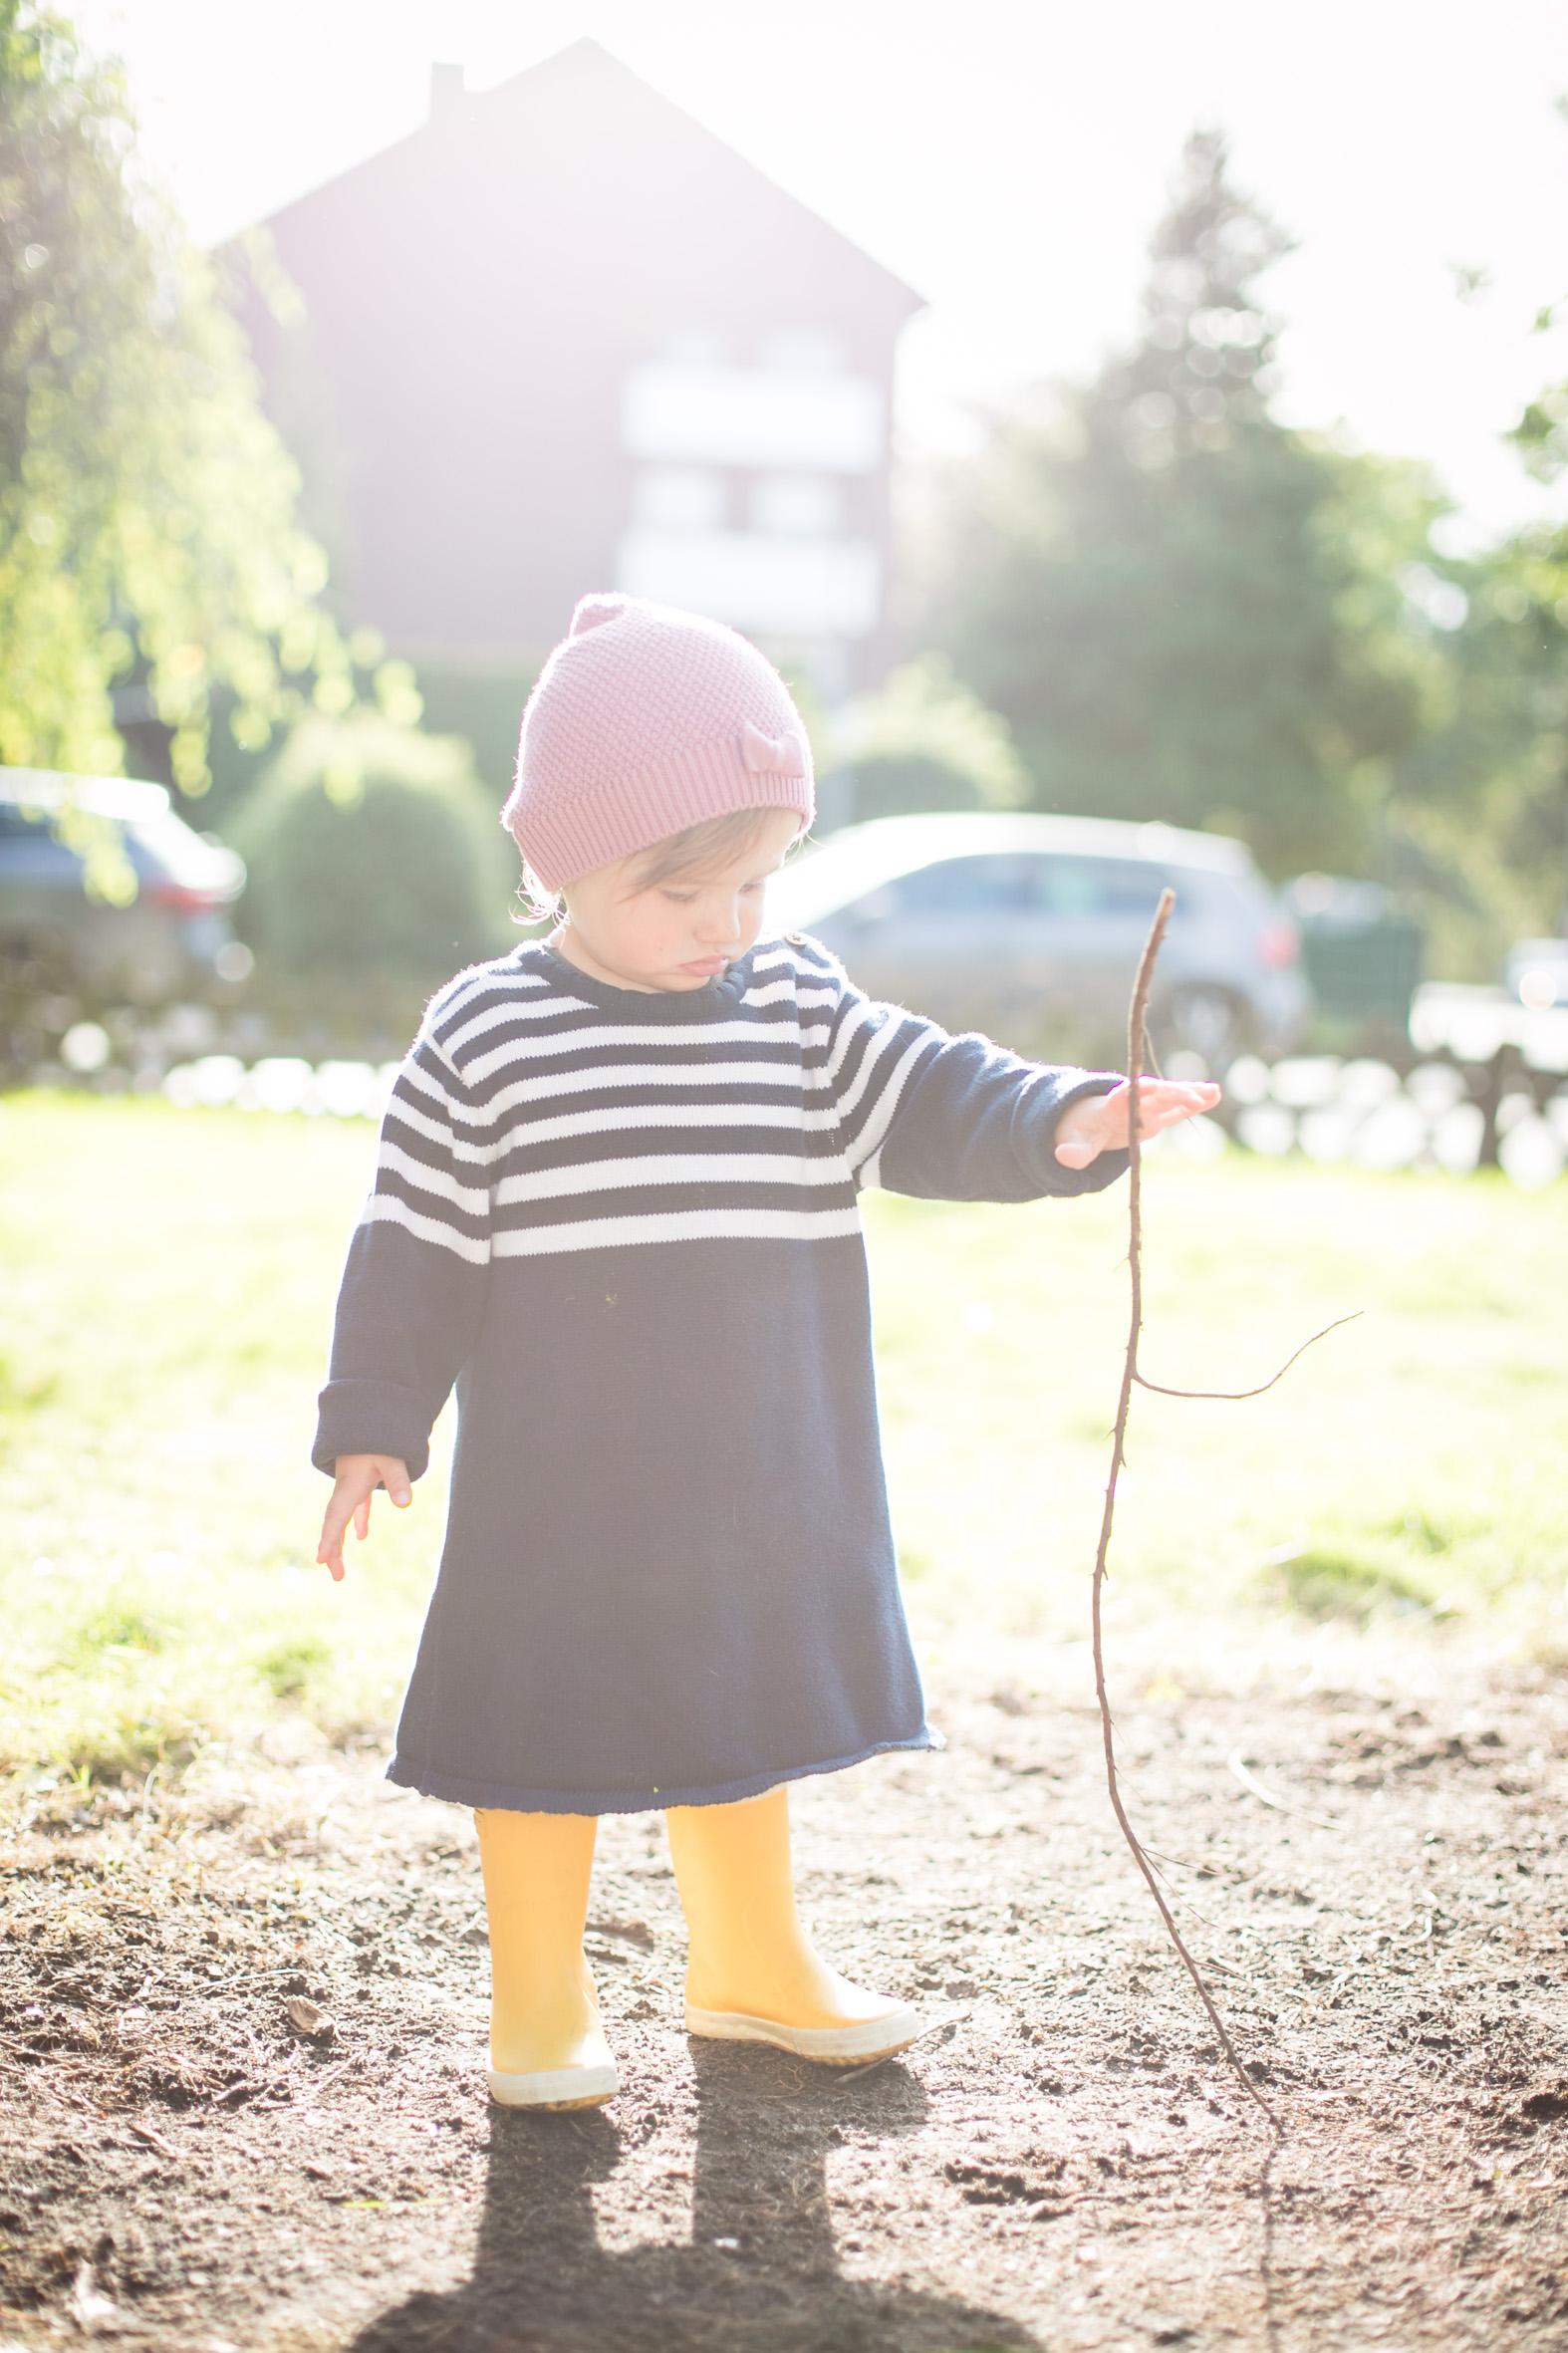 Kinderfotografin Münster